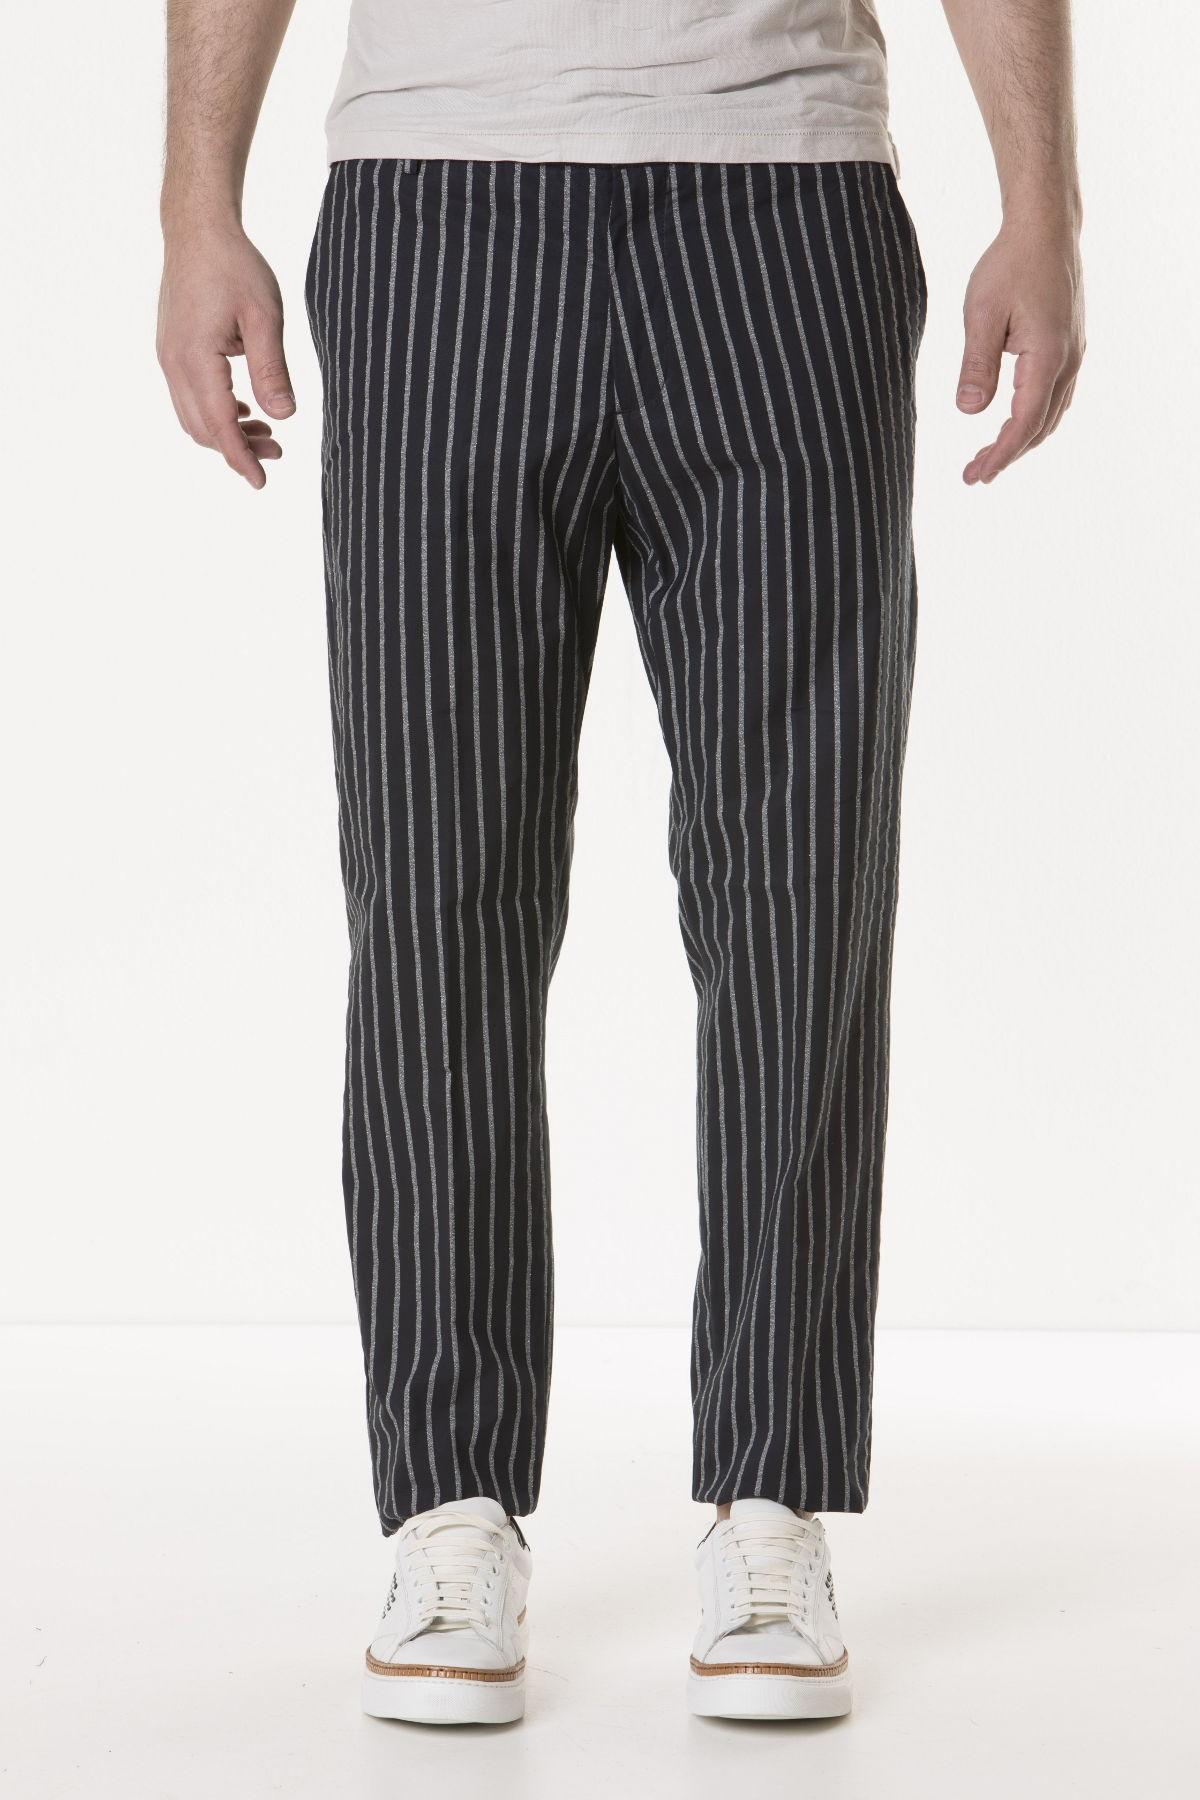 Pantaloni per uomo MYTSH